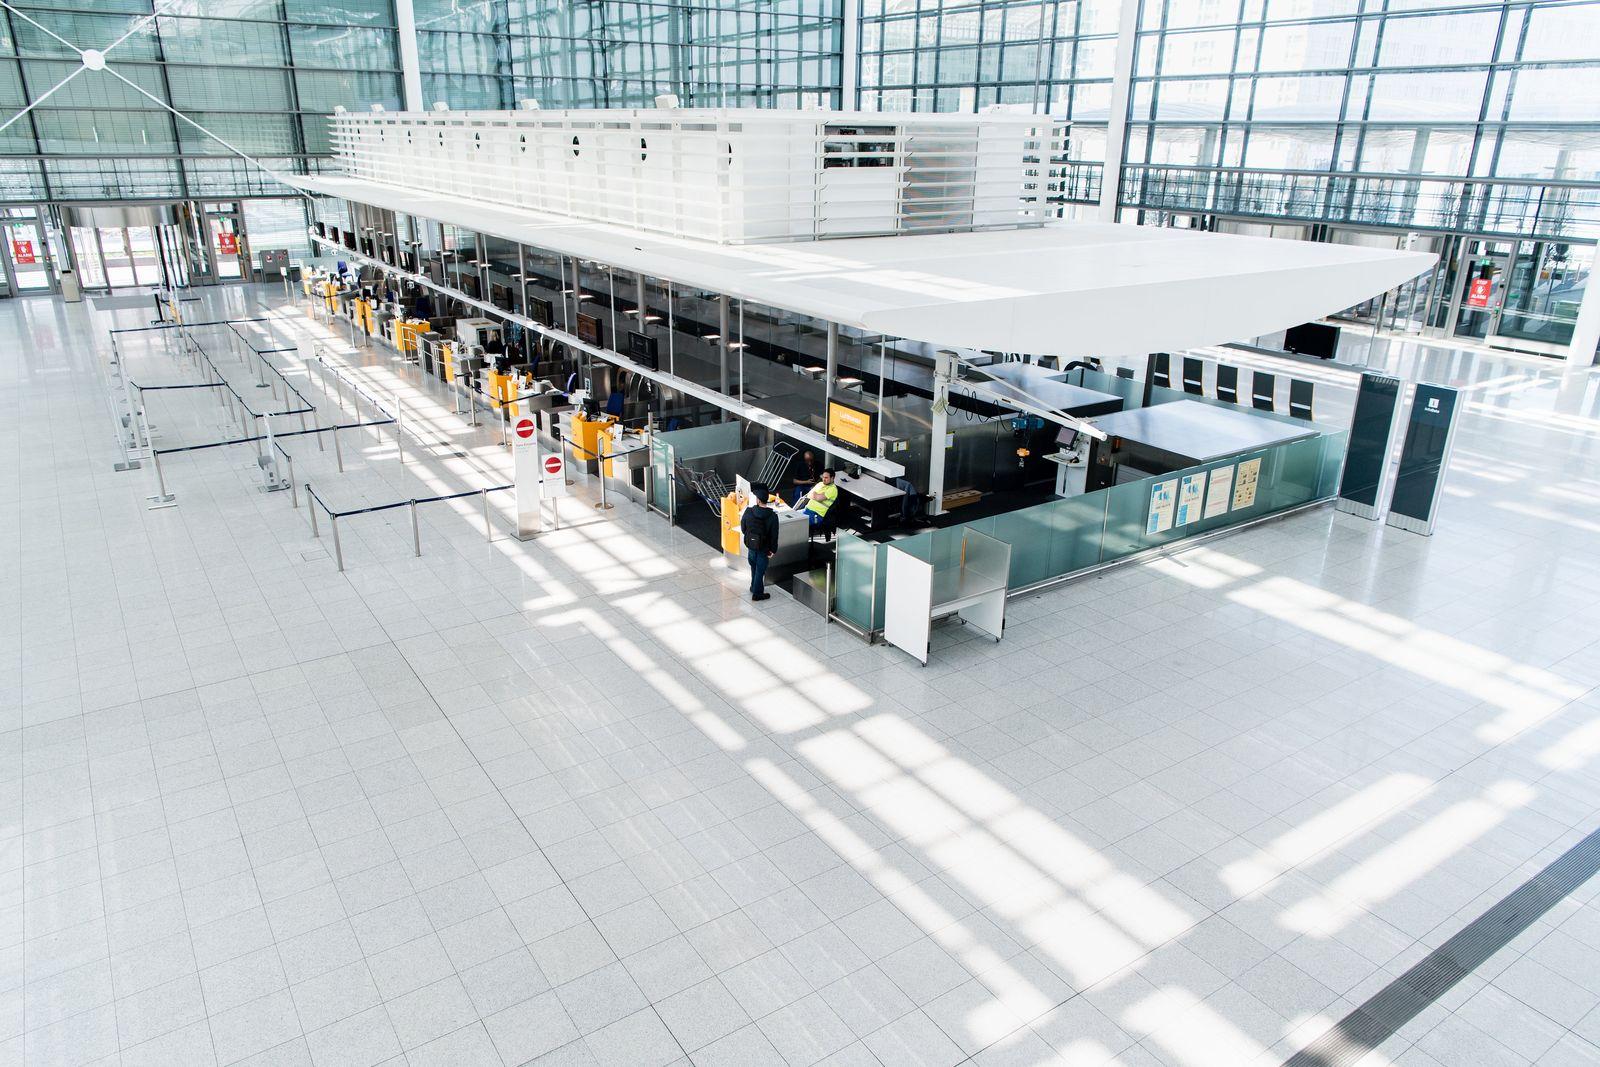 Coronavirus - Flughafen München